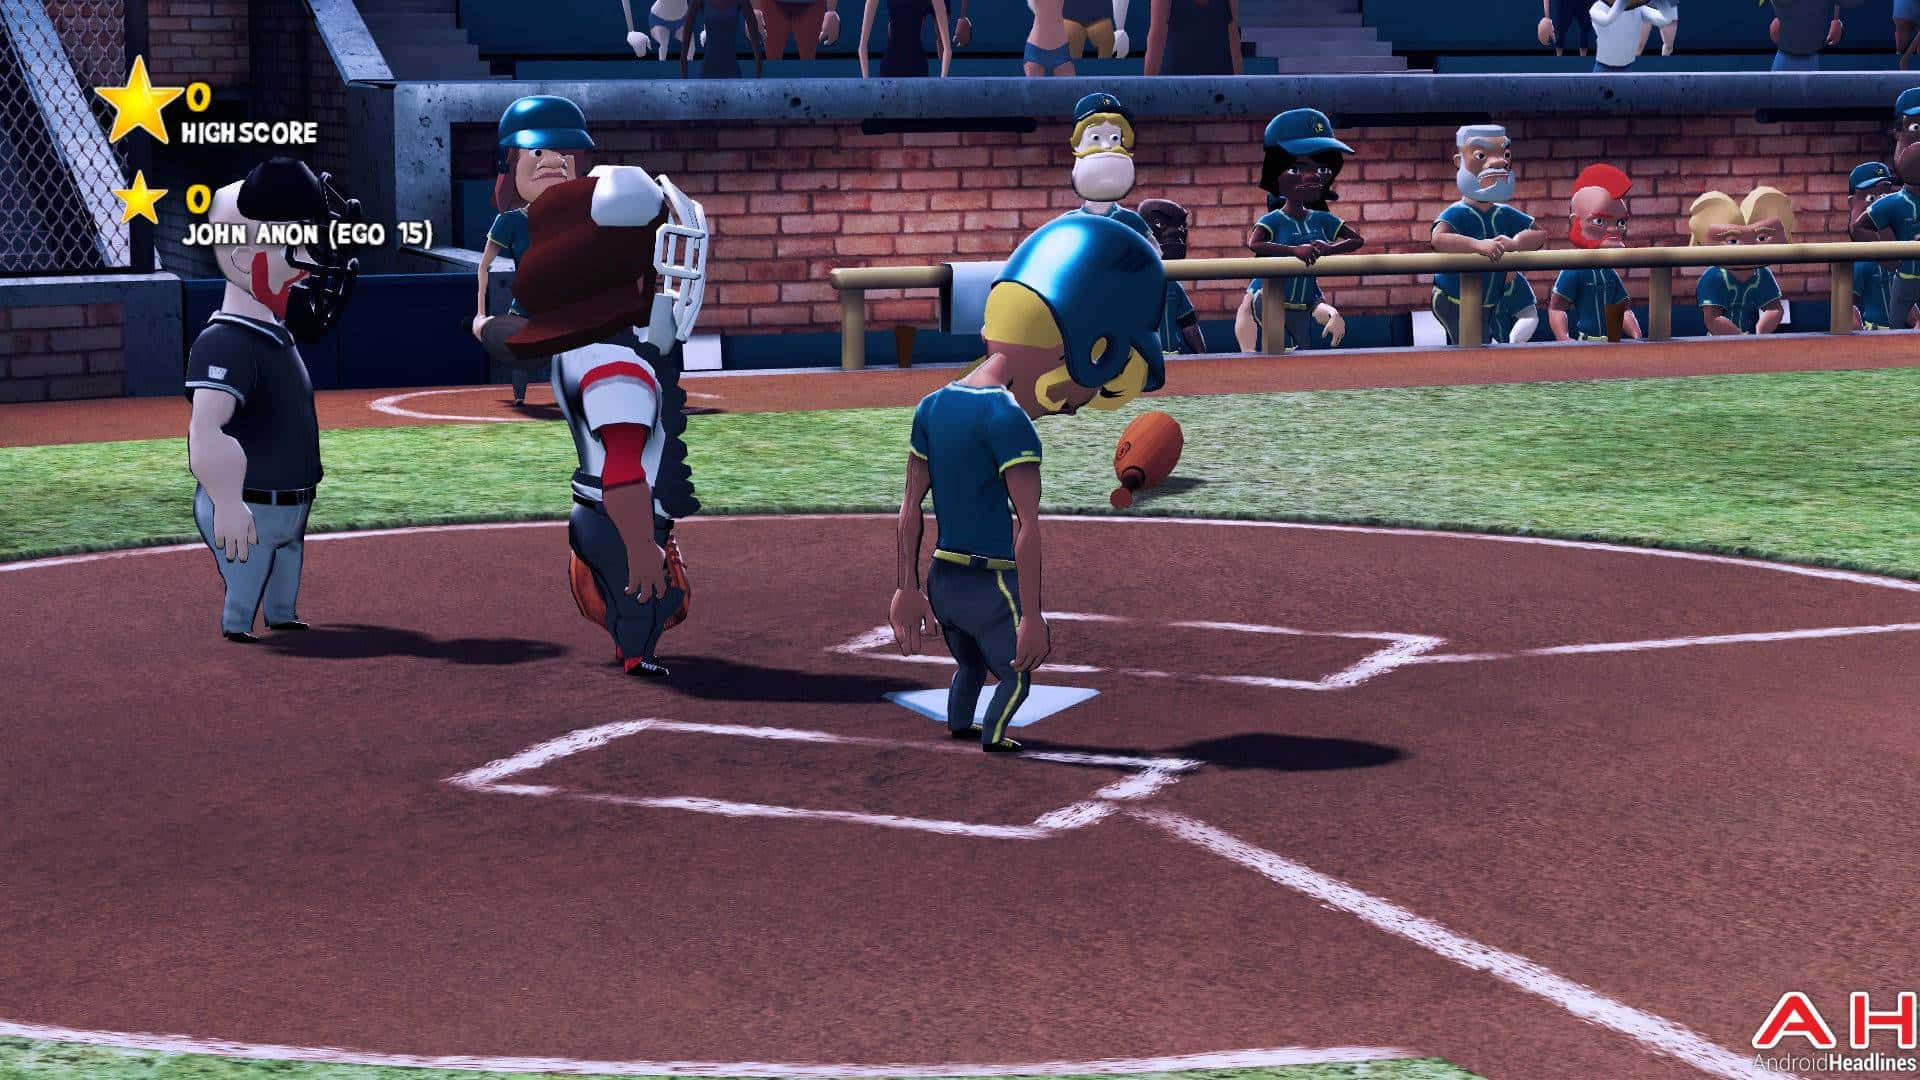 Super Mega Baseball Android TV AH 10